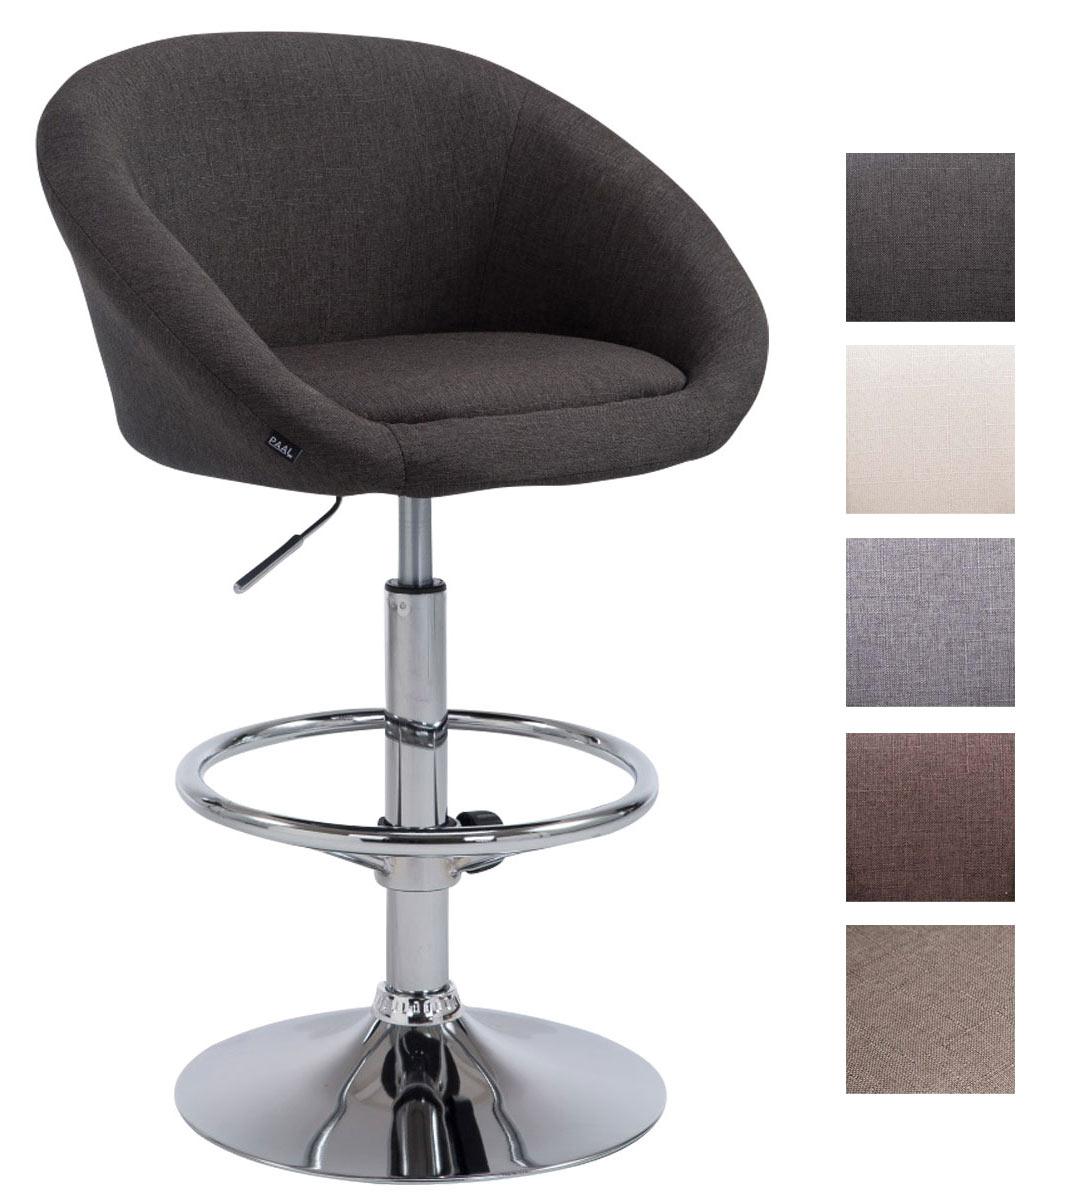 tabouret de bar miami v2 tissu pied trompette chrom comptoir coussin rembourr ebay. Black Bedroom Furniture Sets. Home Design Ideas